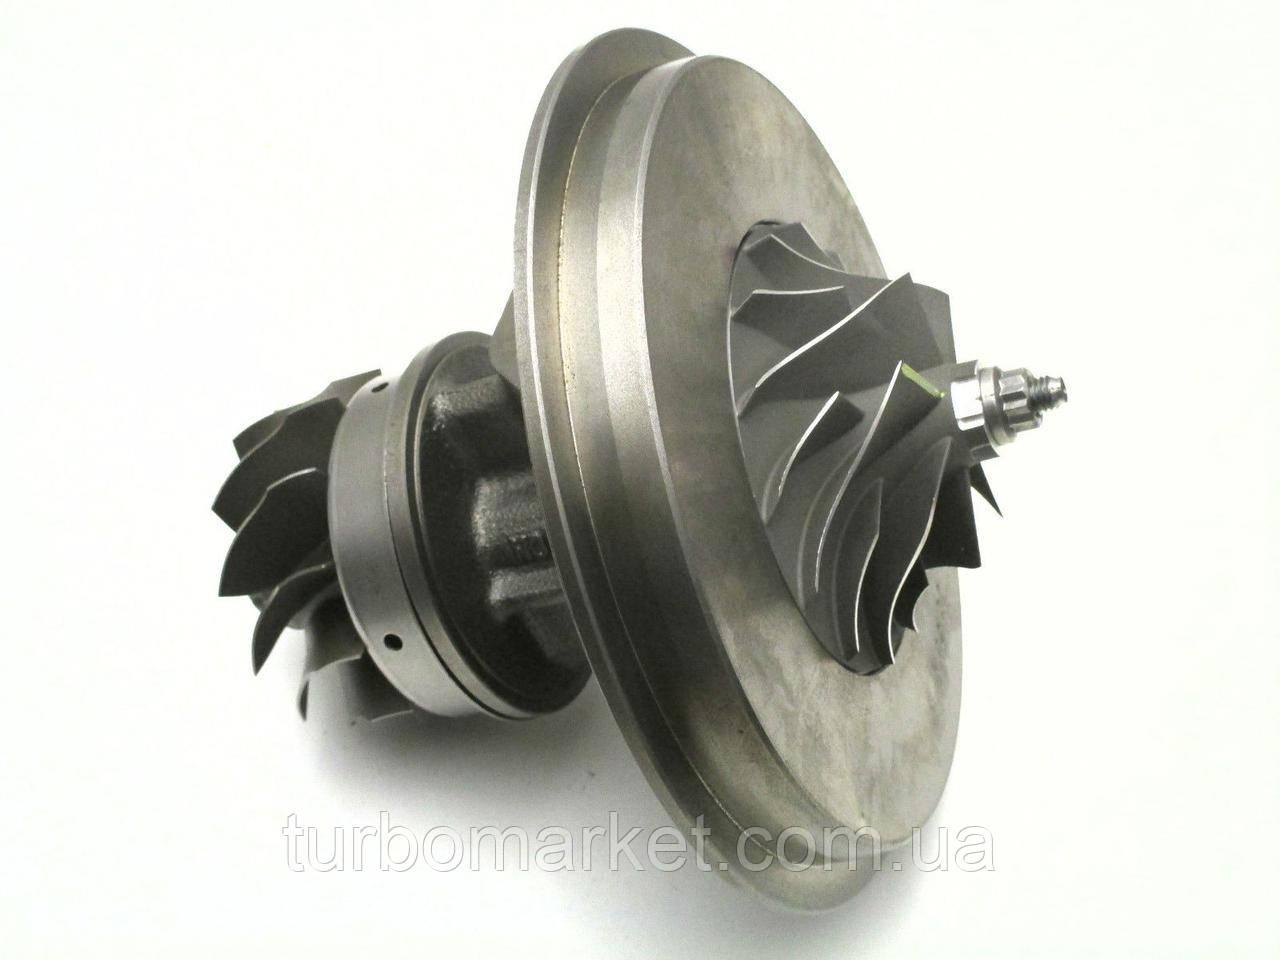 Картридж турбины Fiat Idea, SJTD, (2007) 1,3D 5435-970-0027, 5435-970-0037